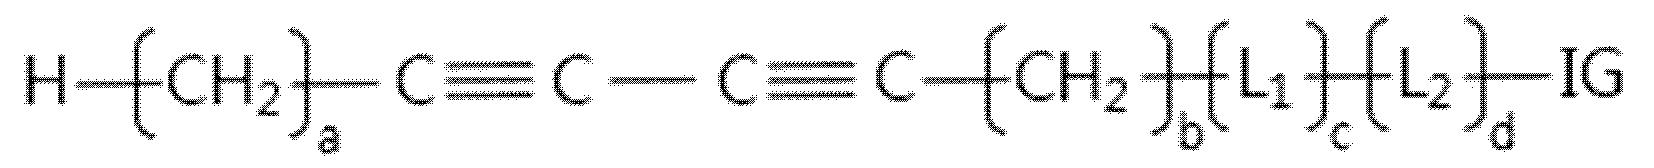 Figure PCTKR2016011399-appb-I000065